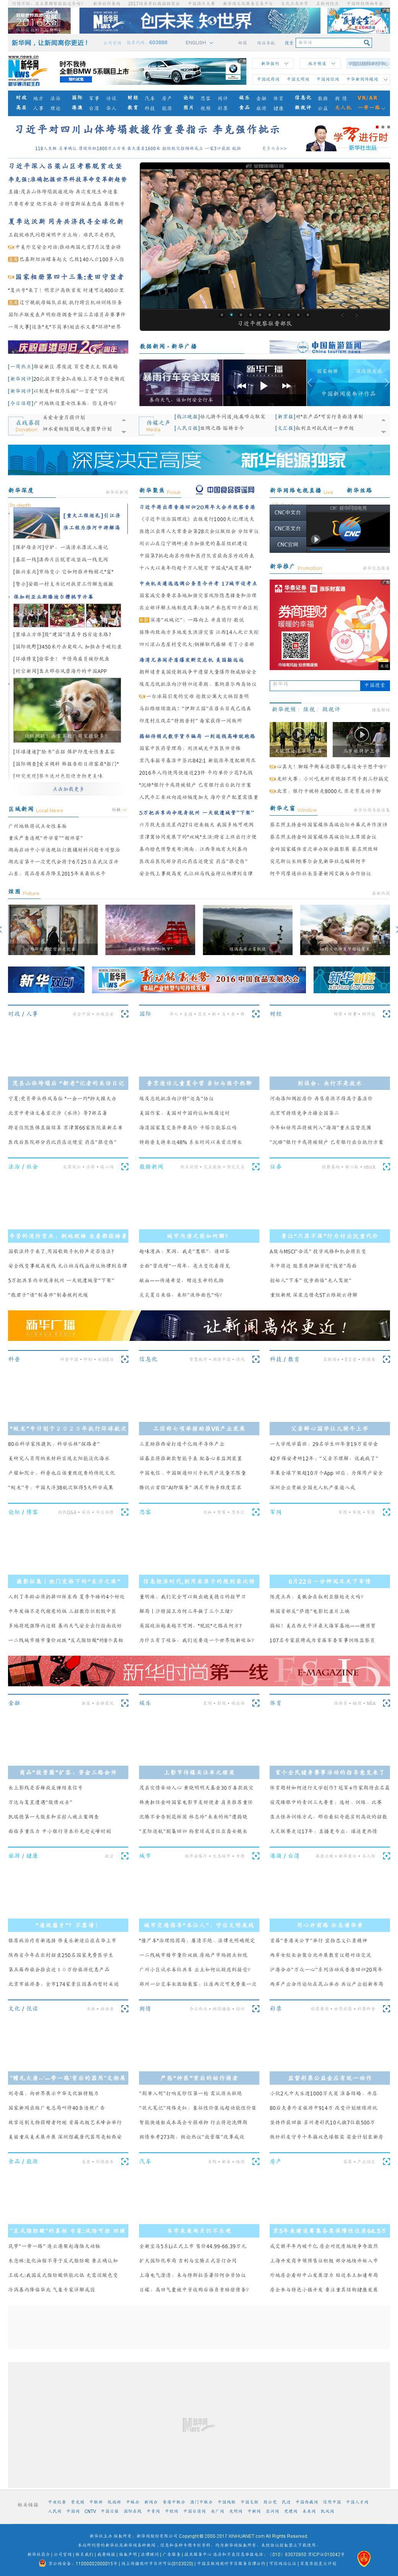 Xinhua at Sunday June 25, 2017, 8:20 a.m. UTC